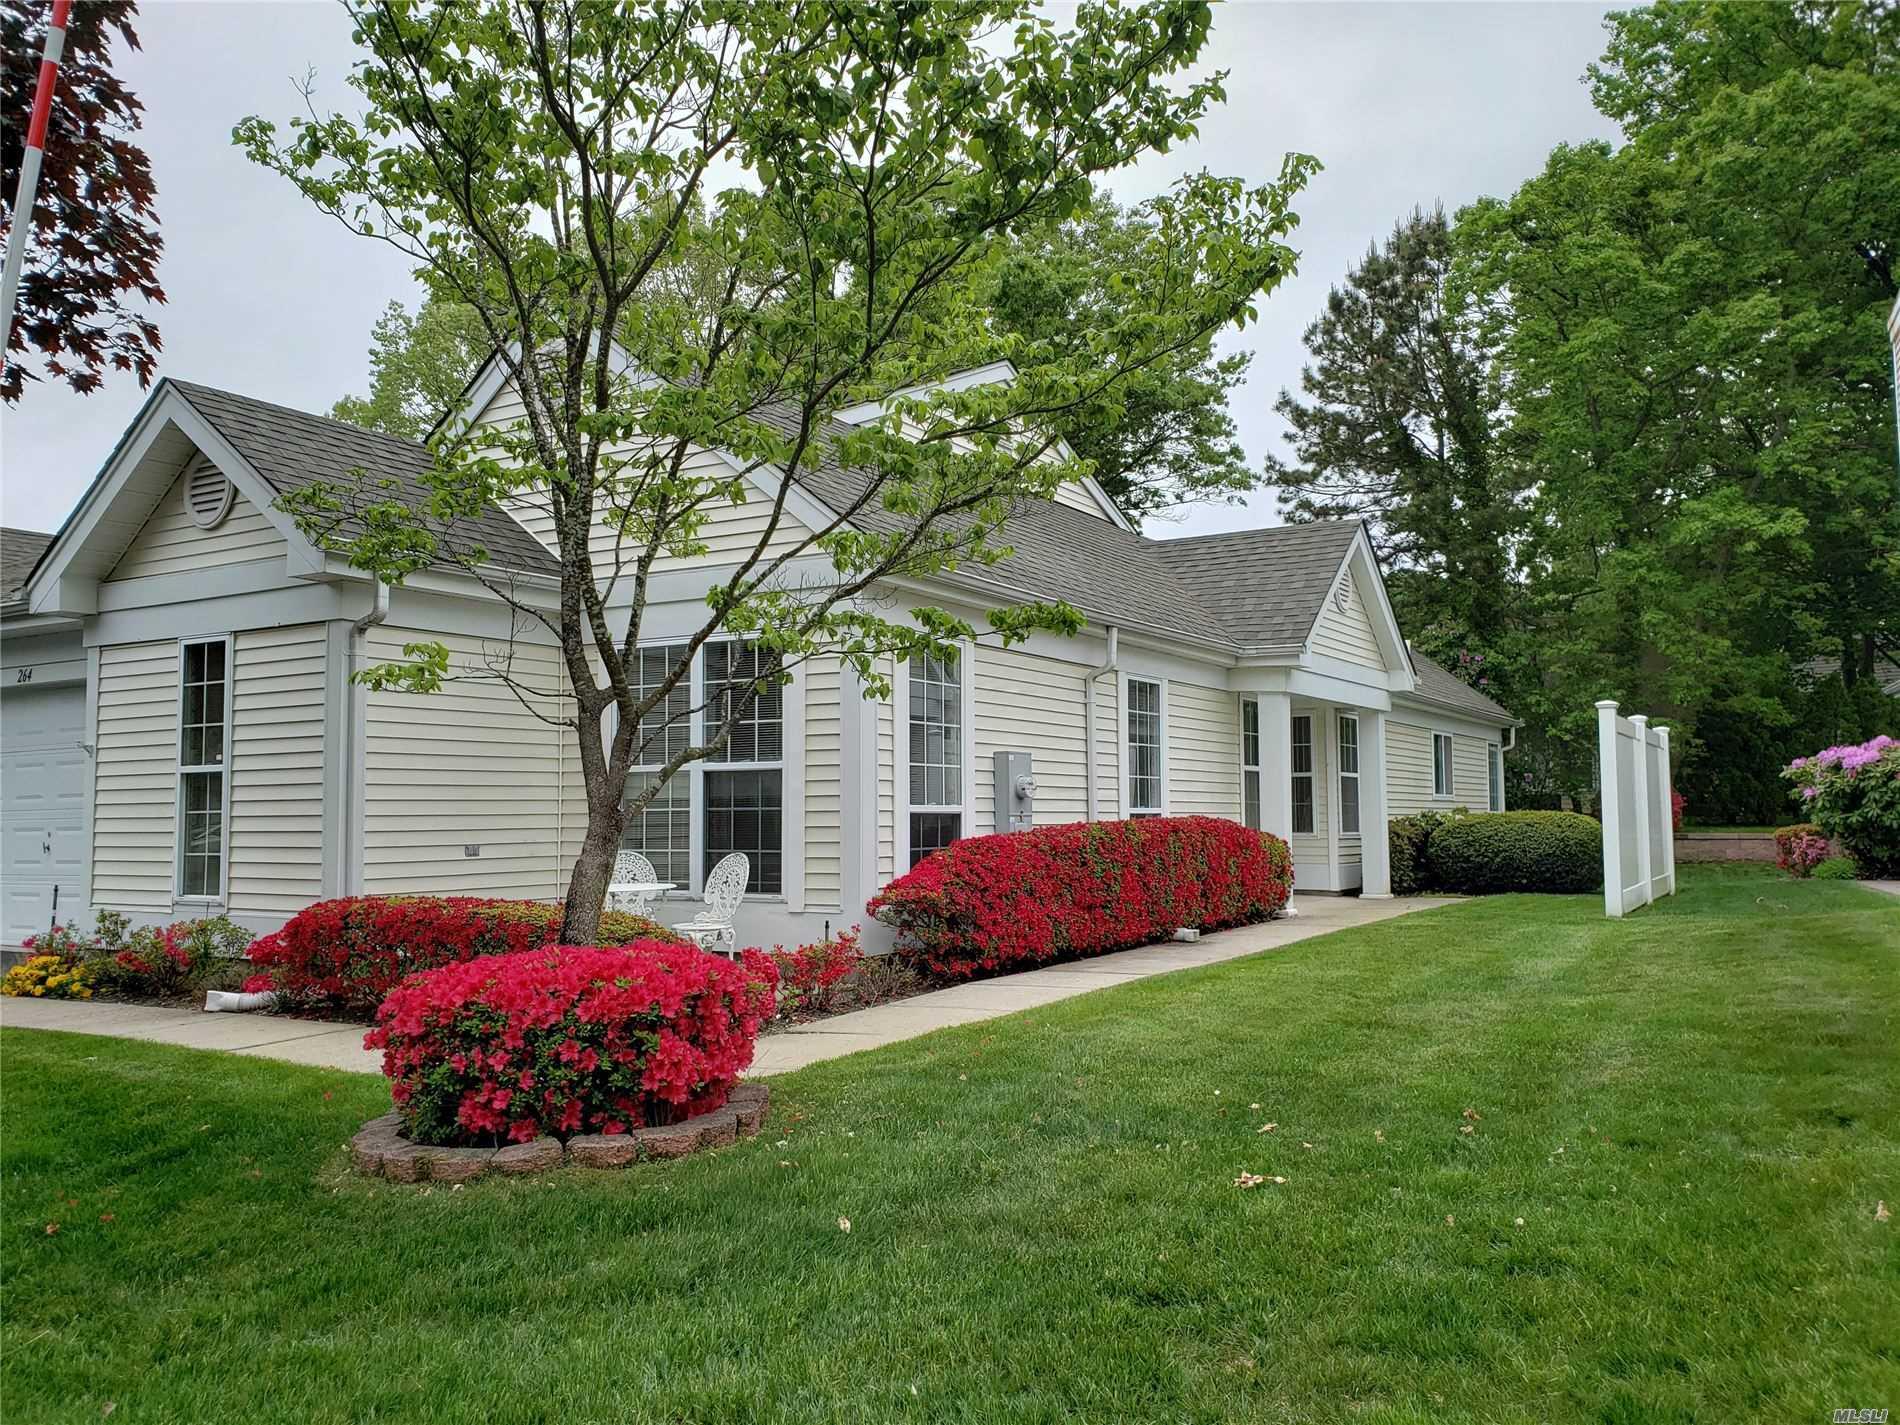 Property for sale at 264 Glen Drive, Ridge NY 11961, Ridge,  New York 11961